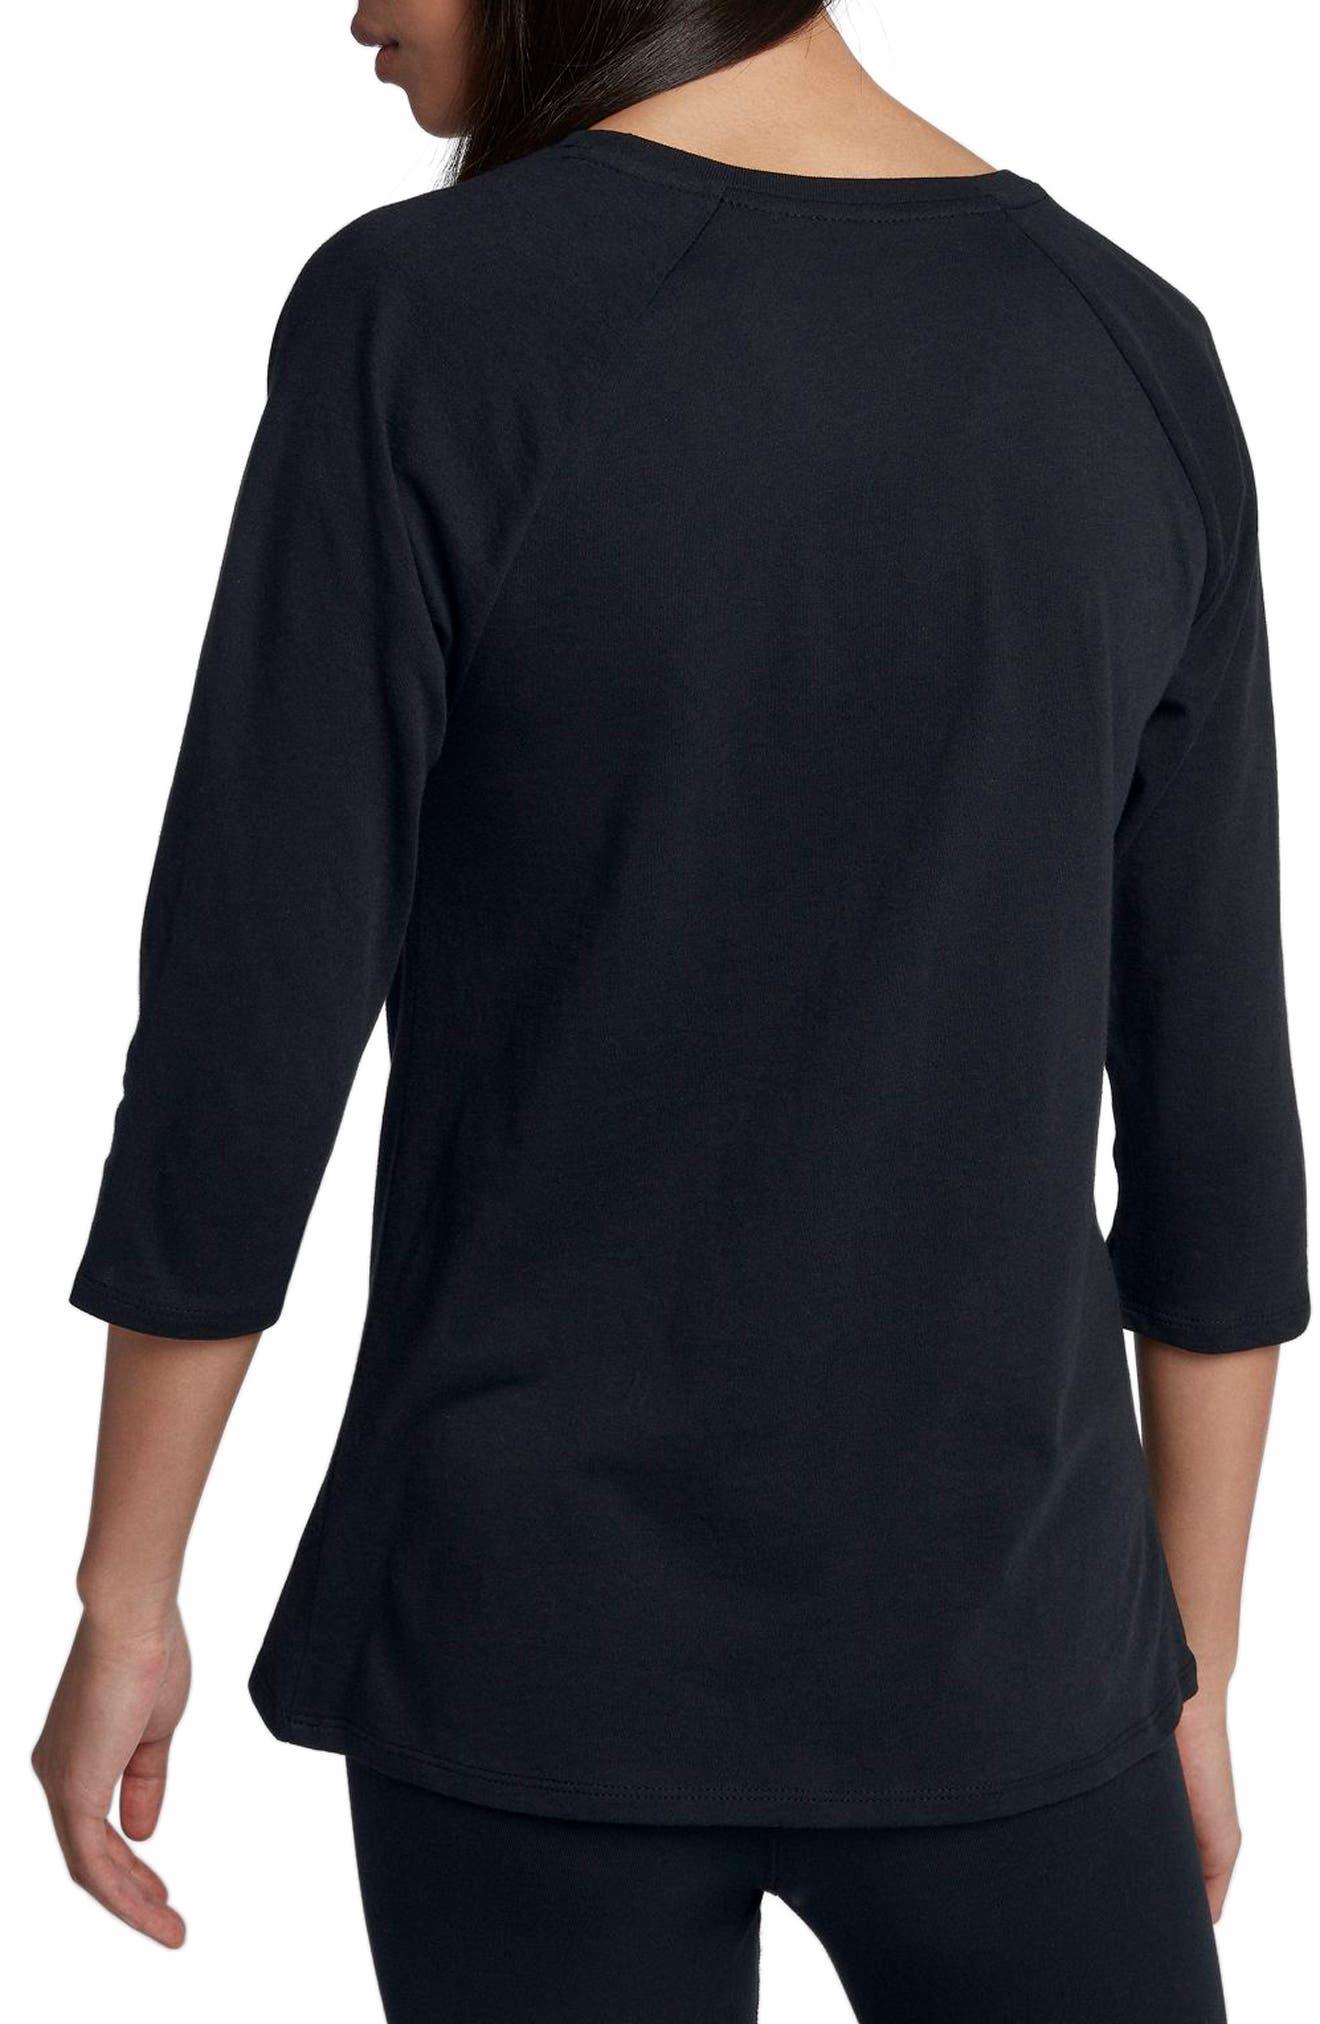 Sportswear The Force Is Female Raglan Tee,                             Alternate thumbnail 2, color,                             Black/ Black/ White